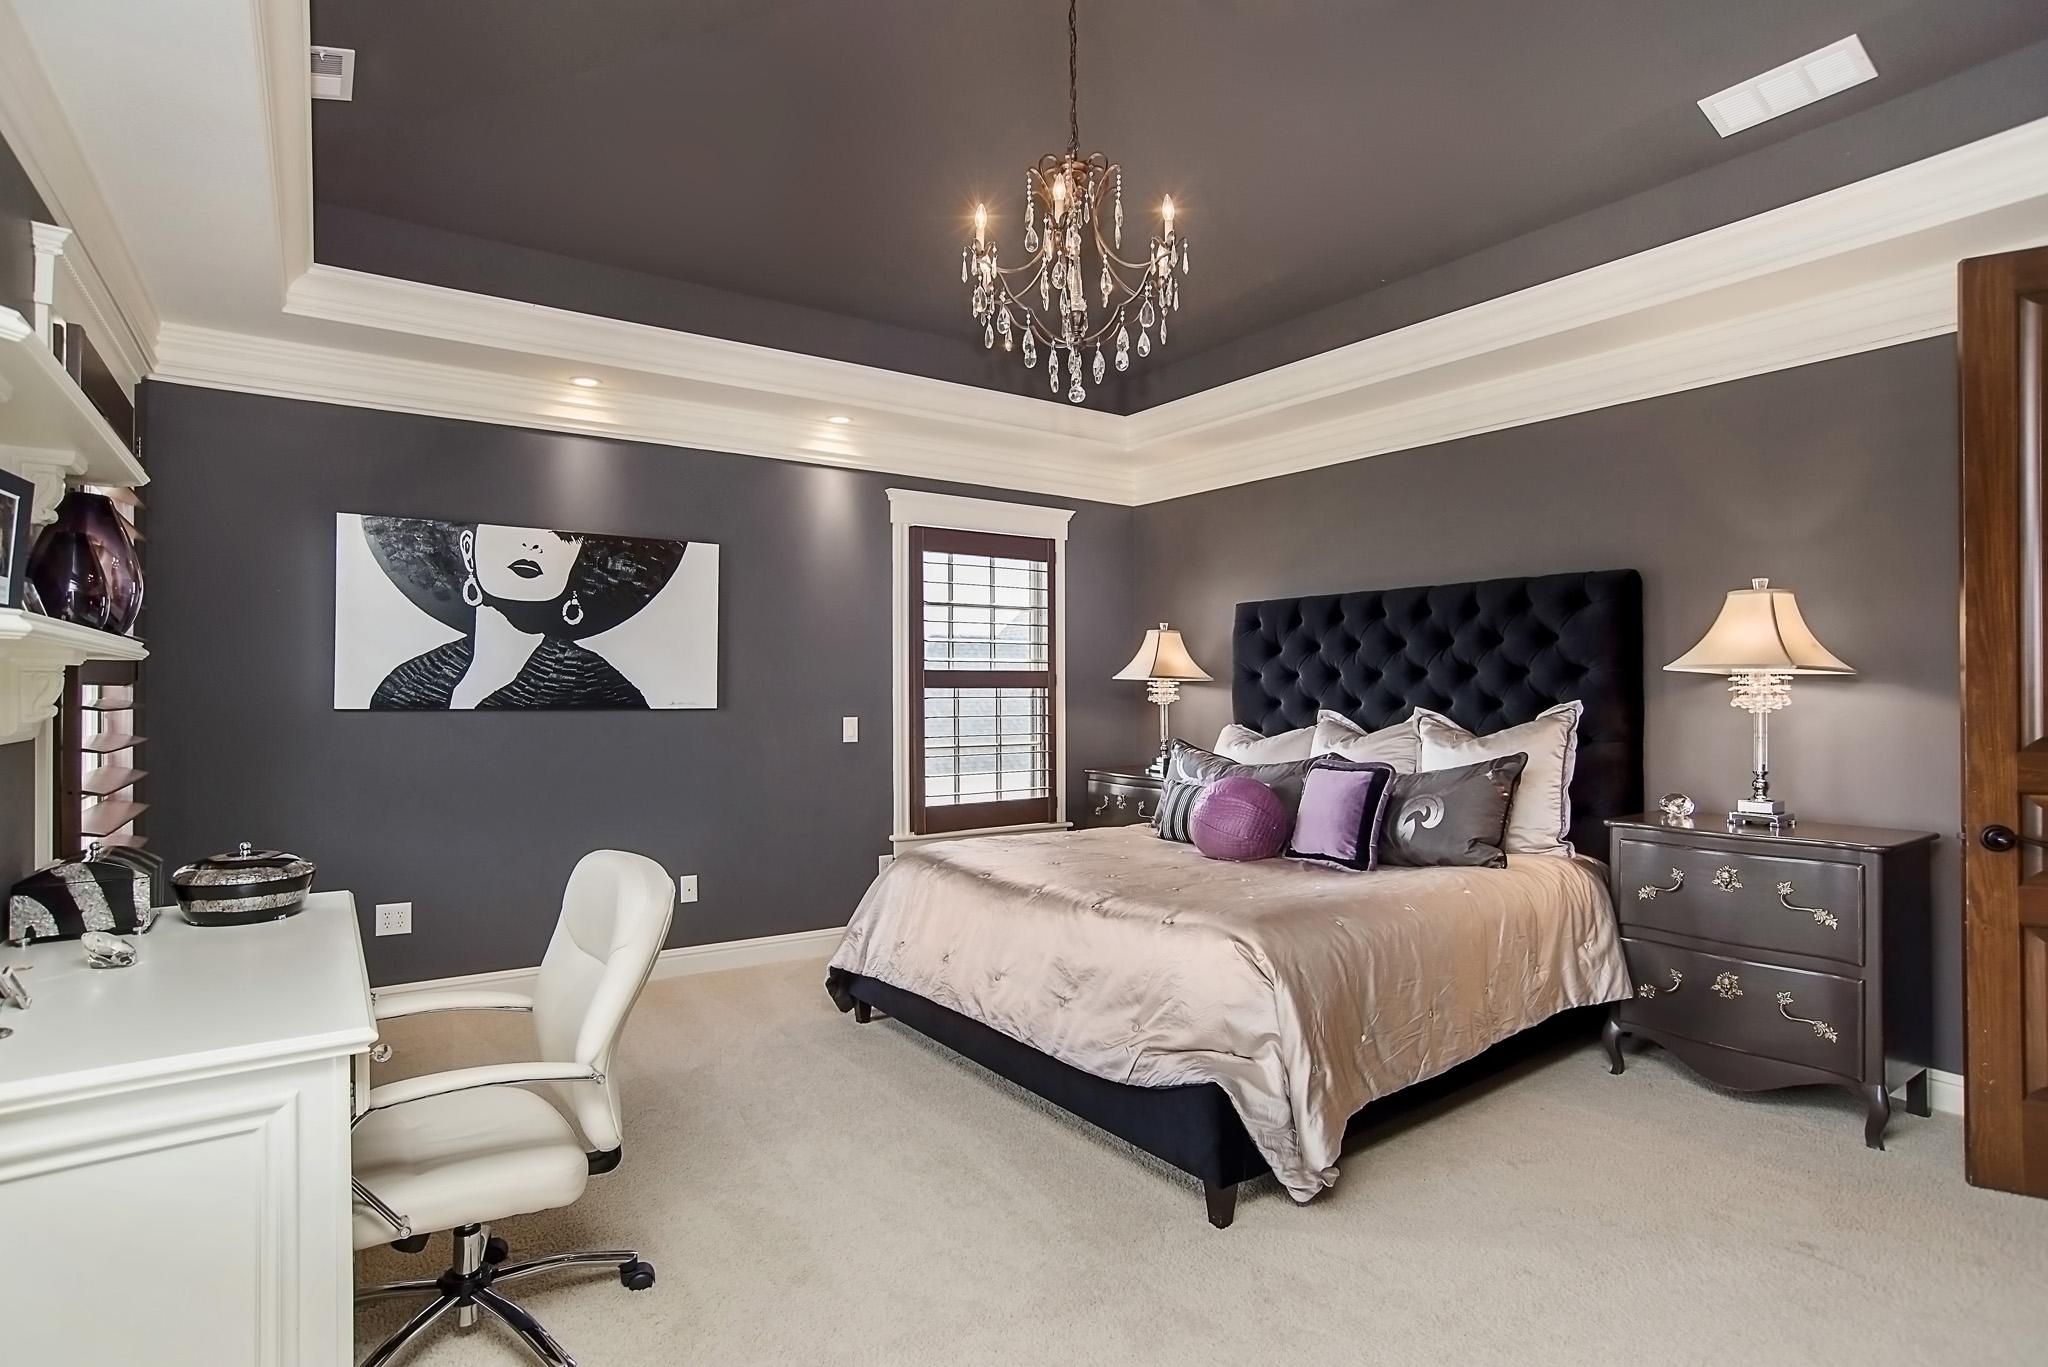 39-Bedroom 2.jpg